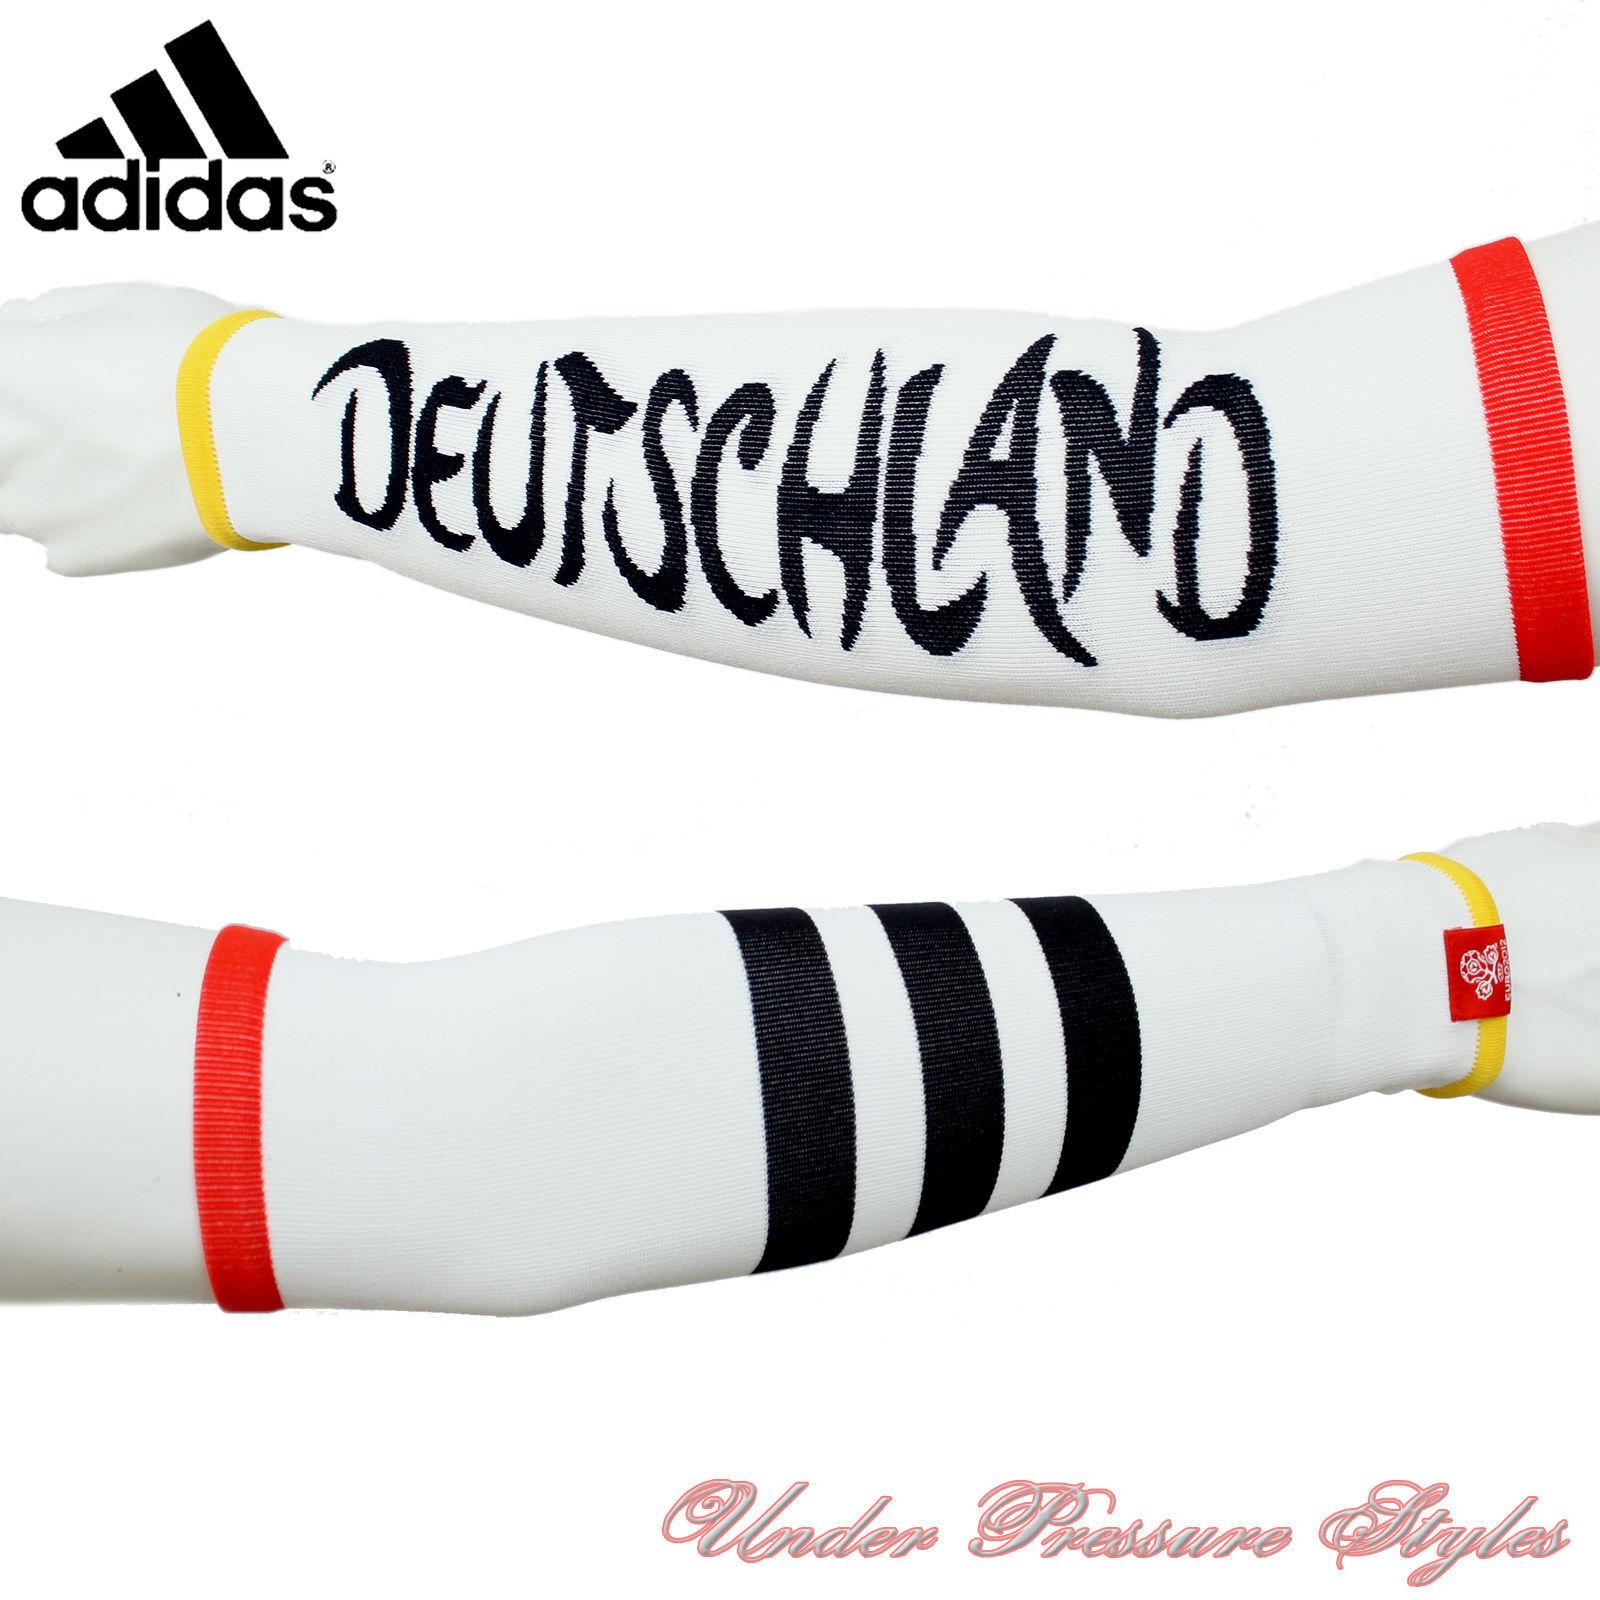 FOOTBALL WM EM Allemagne DFB Article de Fan adidas adidas adidas manche manches 4c83aa